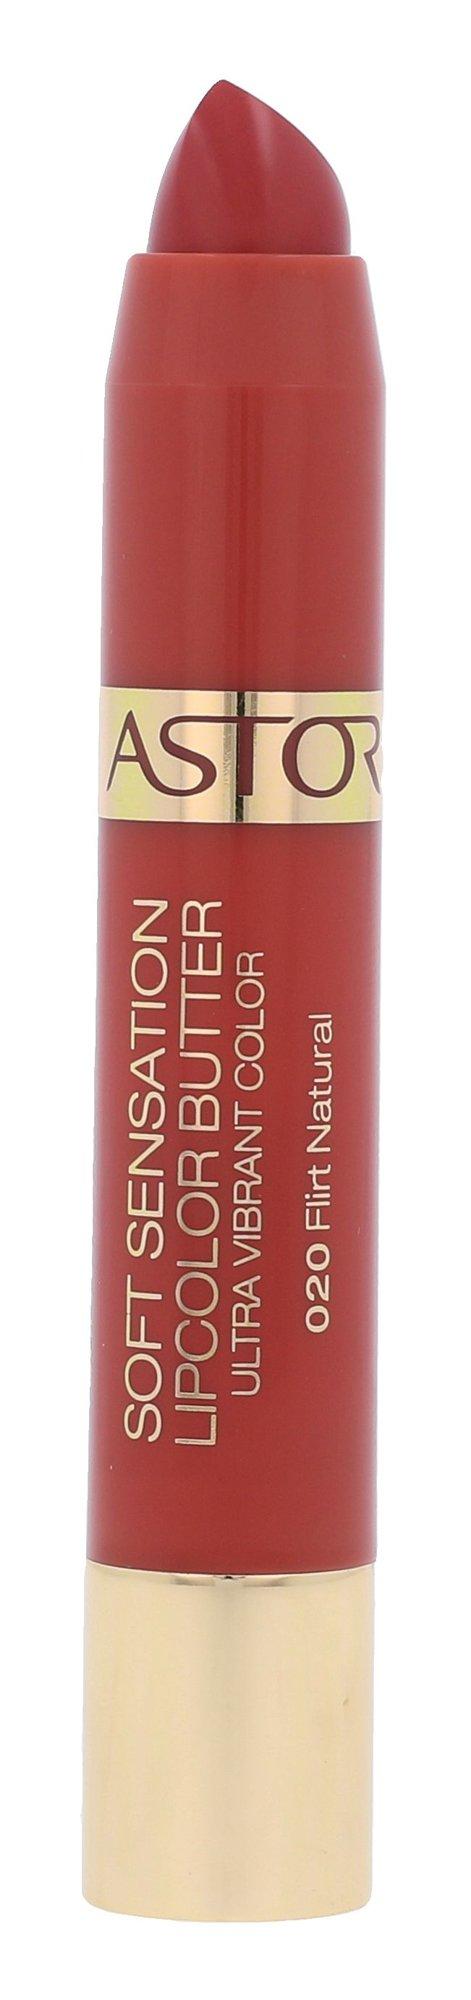 Lūpų dažai Astor Soft Sensation Lipcolor Butter